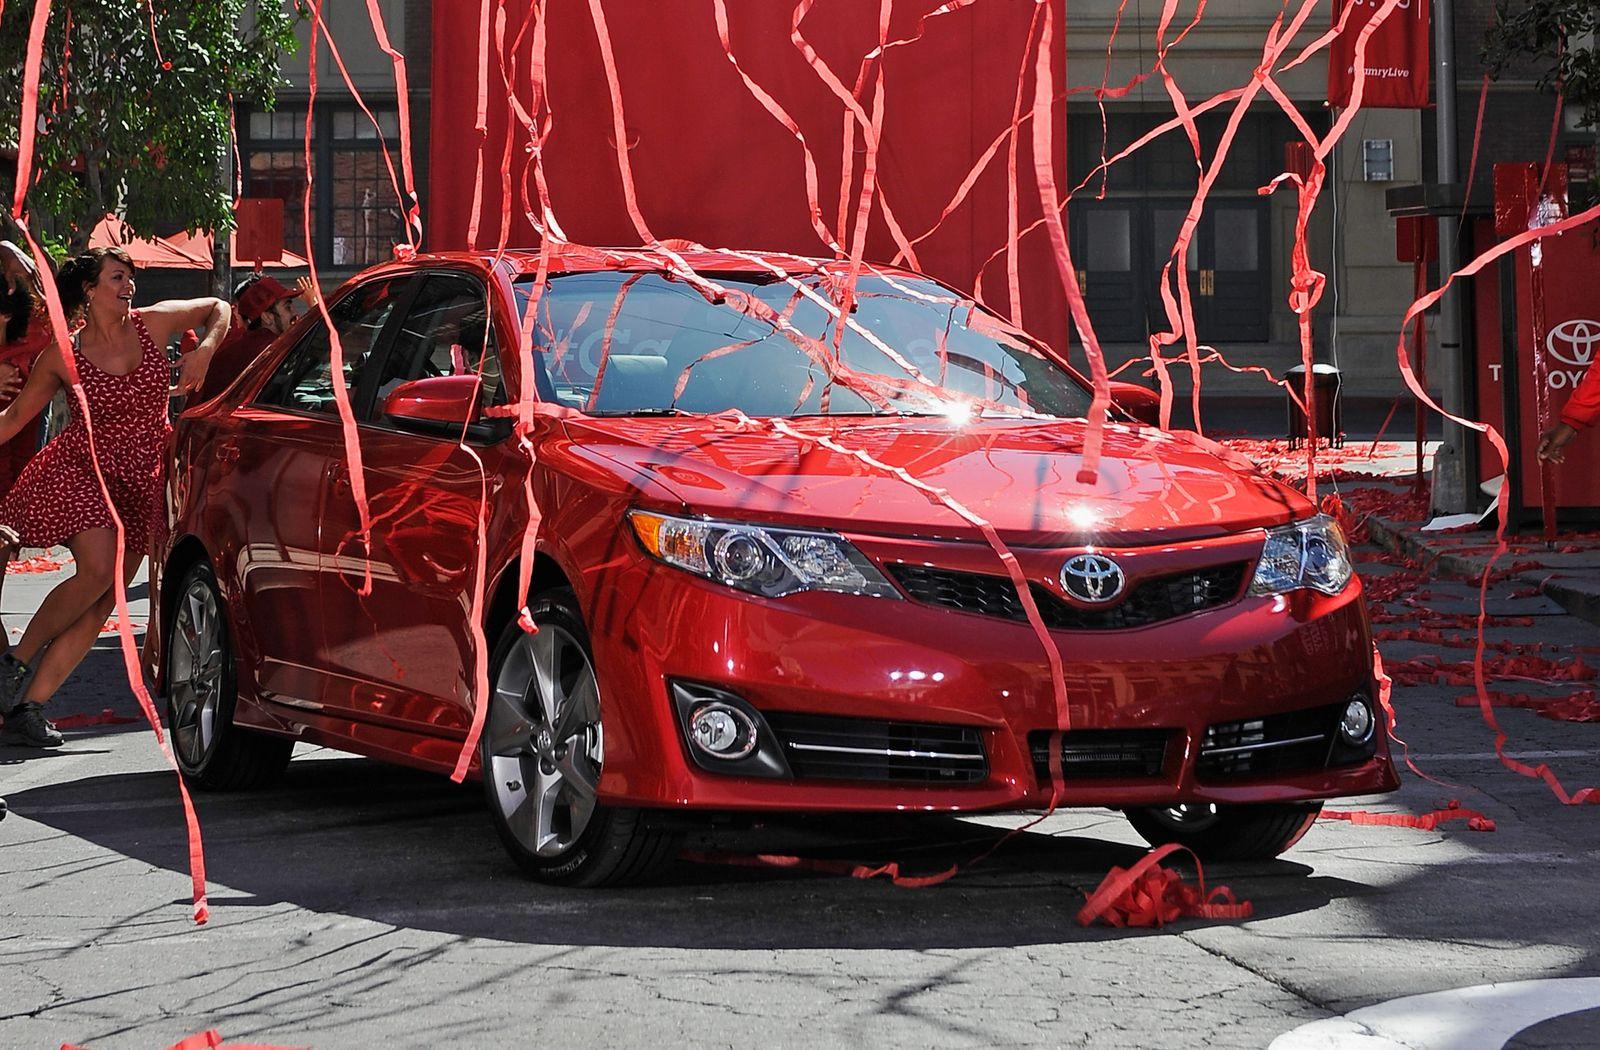 USA / US-Modelle / Toyota Camry SE / Kalifornien